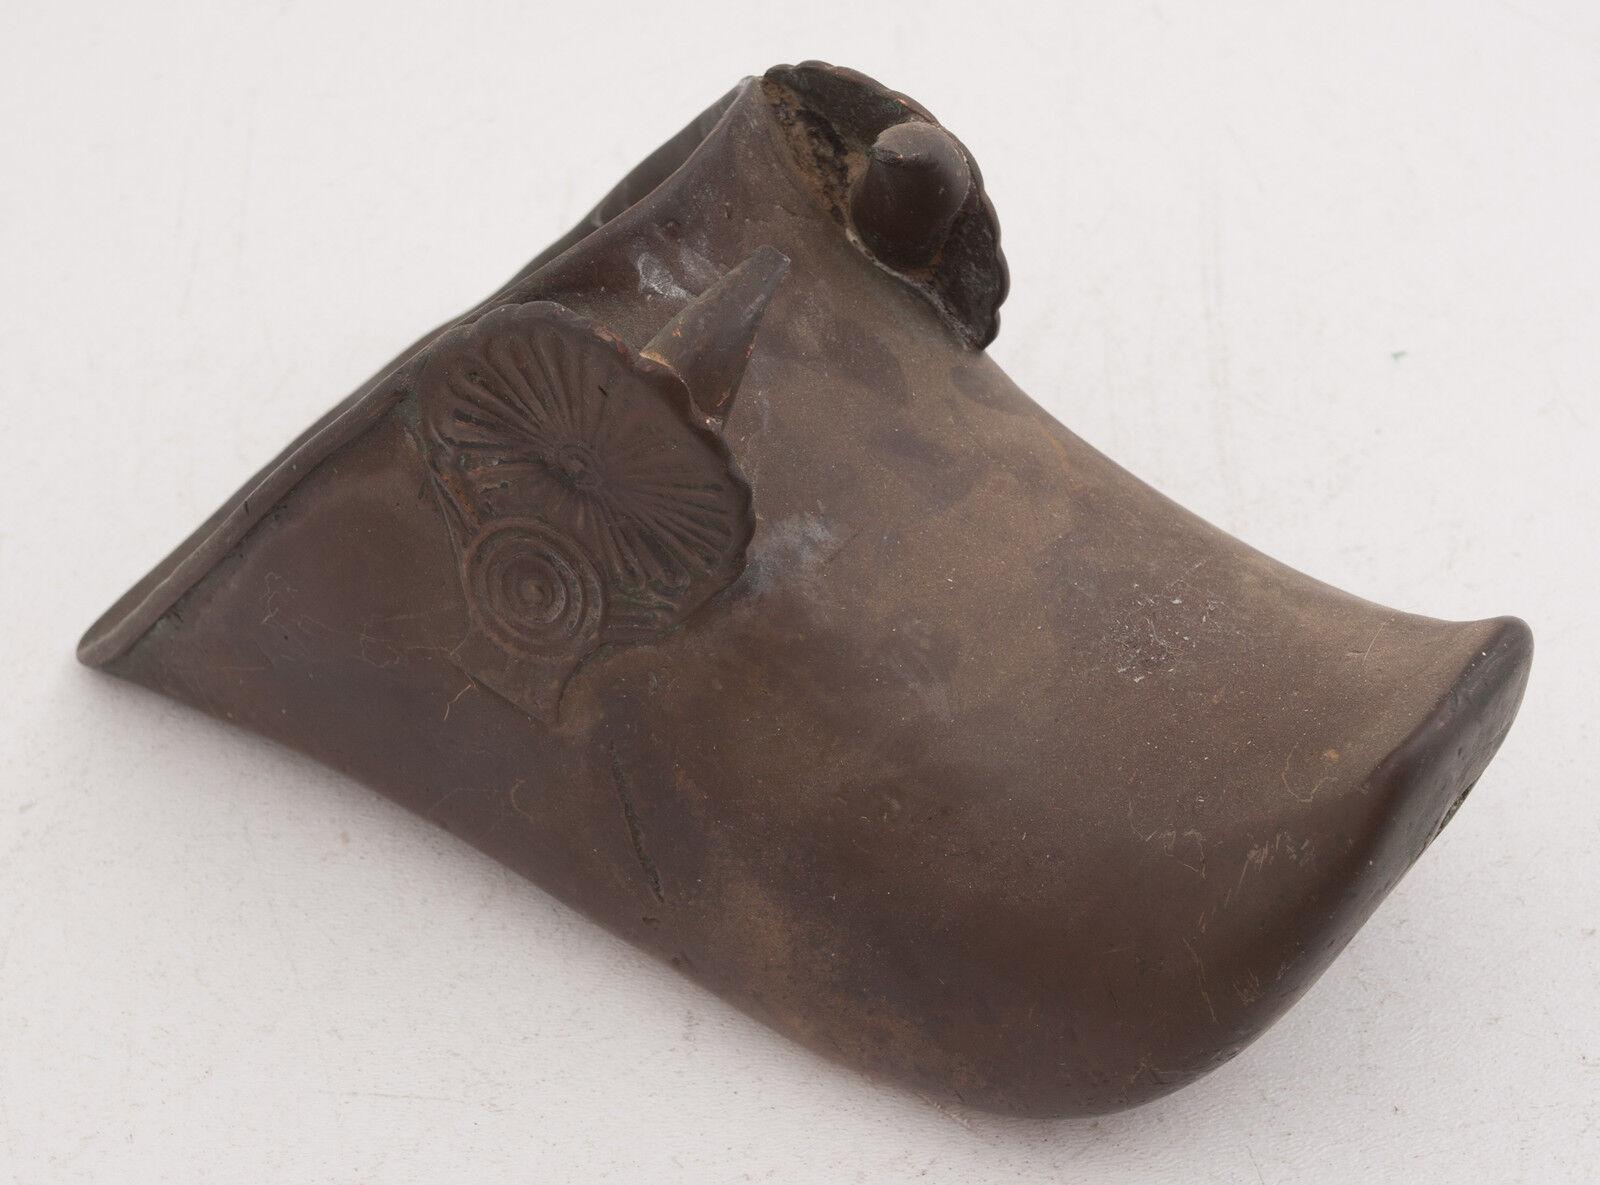 Brass Conquistador Horse Stirrup Equestrian Boot Rest (B3L) Foot Samurai   online shopping and fashion store